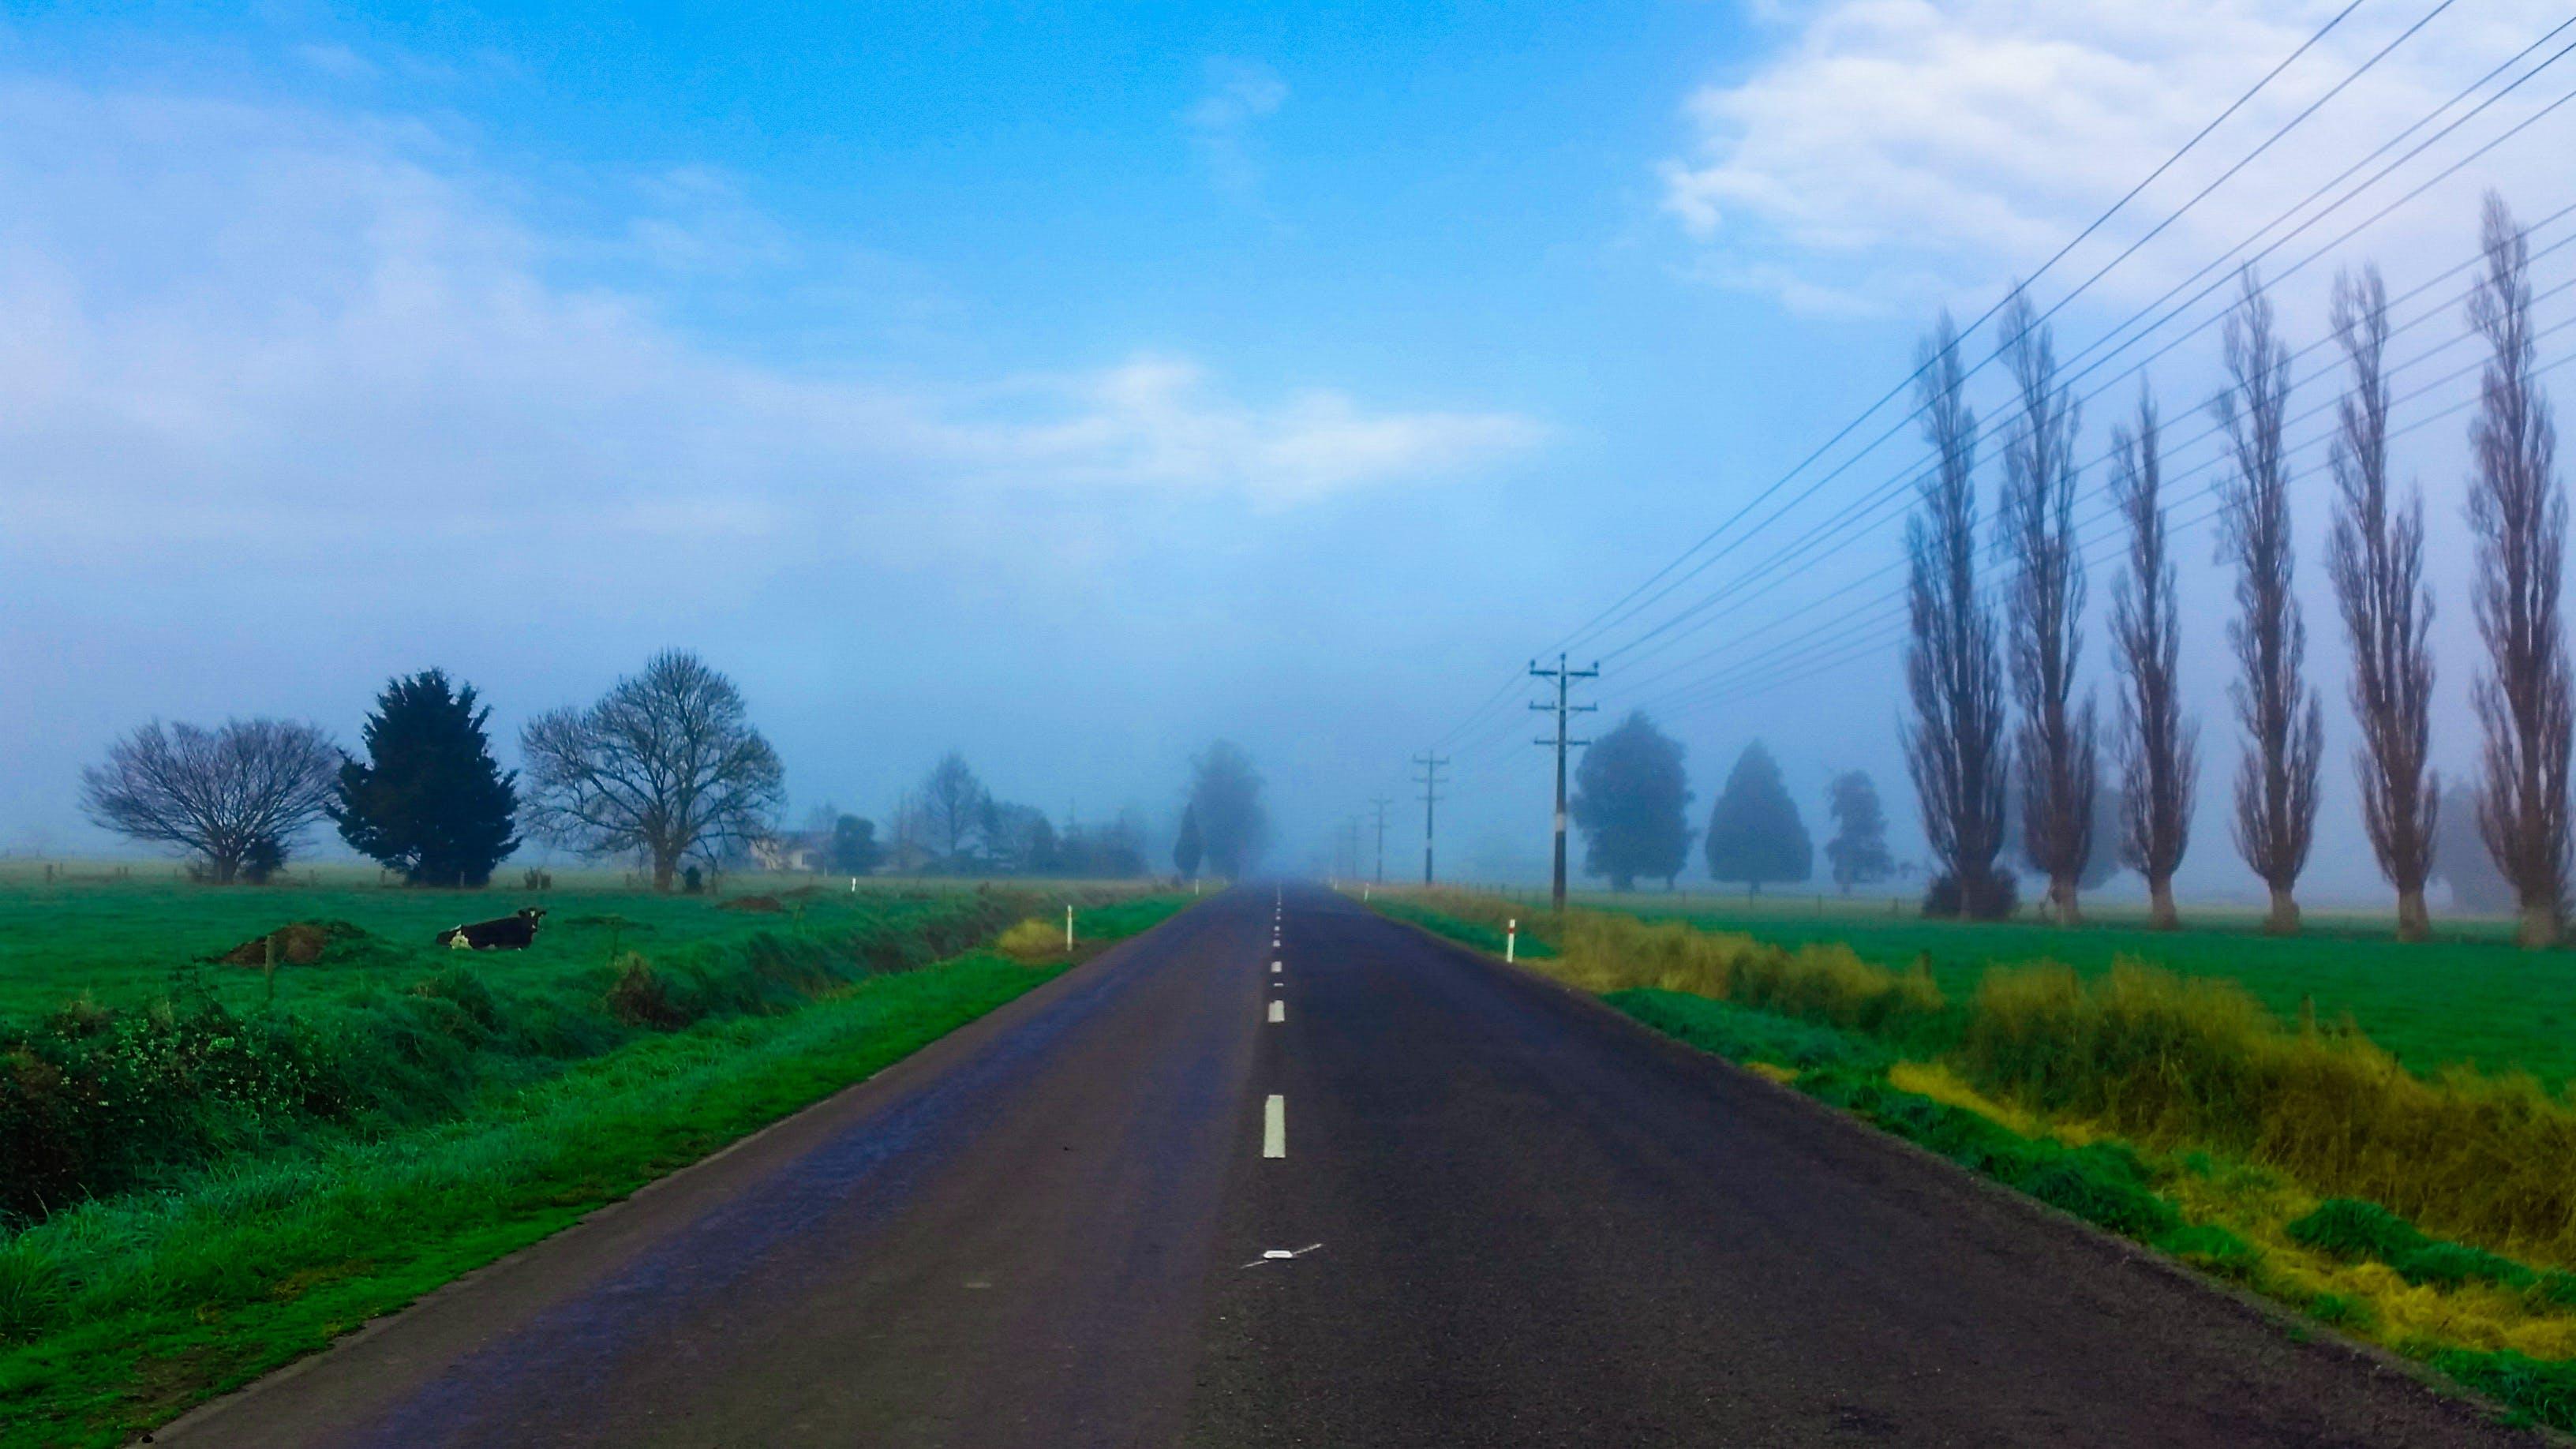 Free stock photo of alone, blue sky, cloudy, empty street